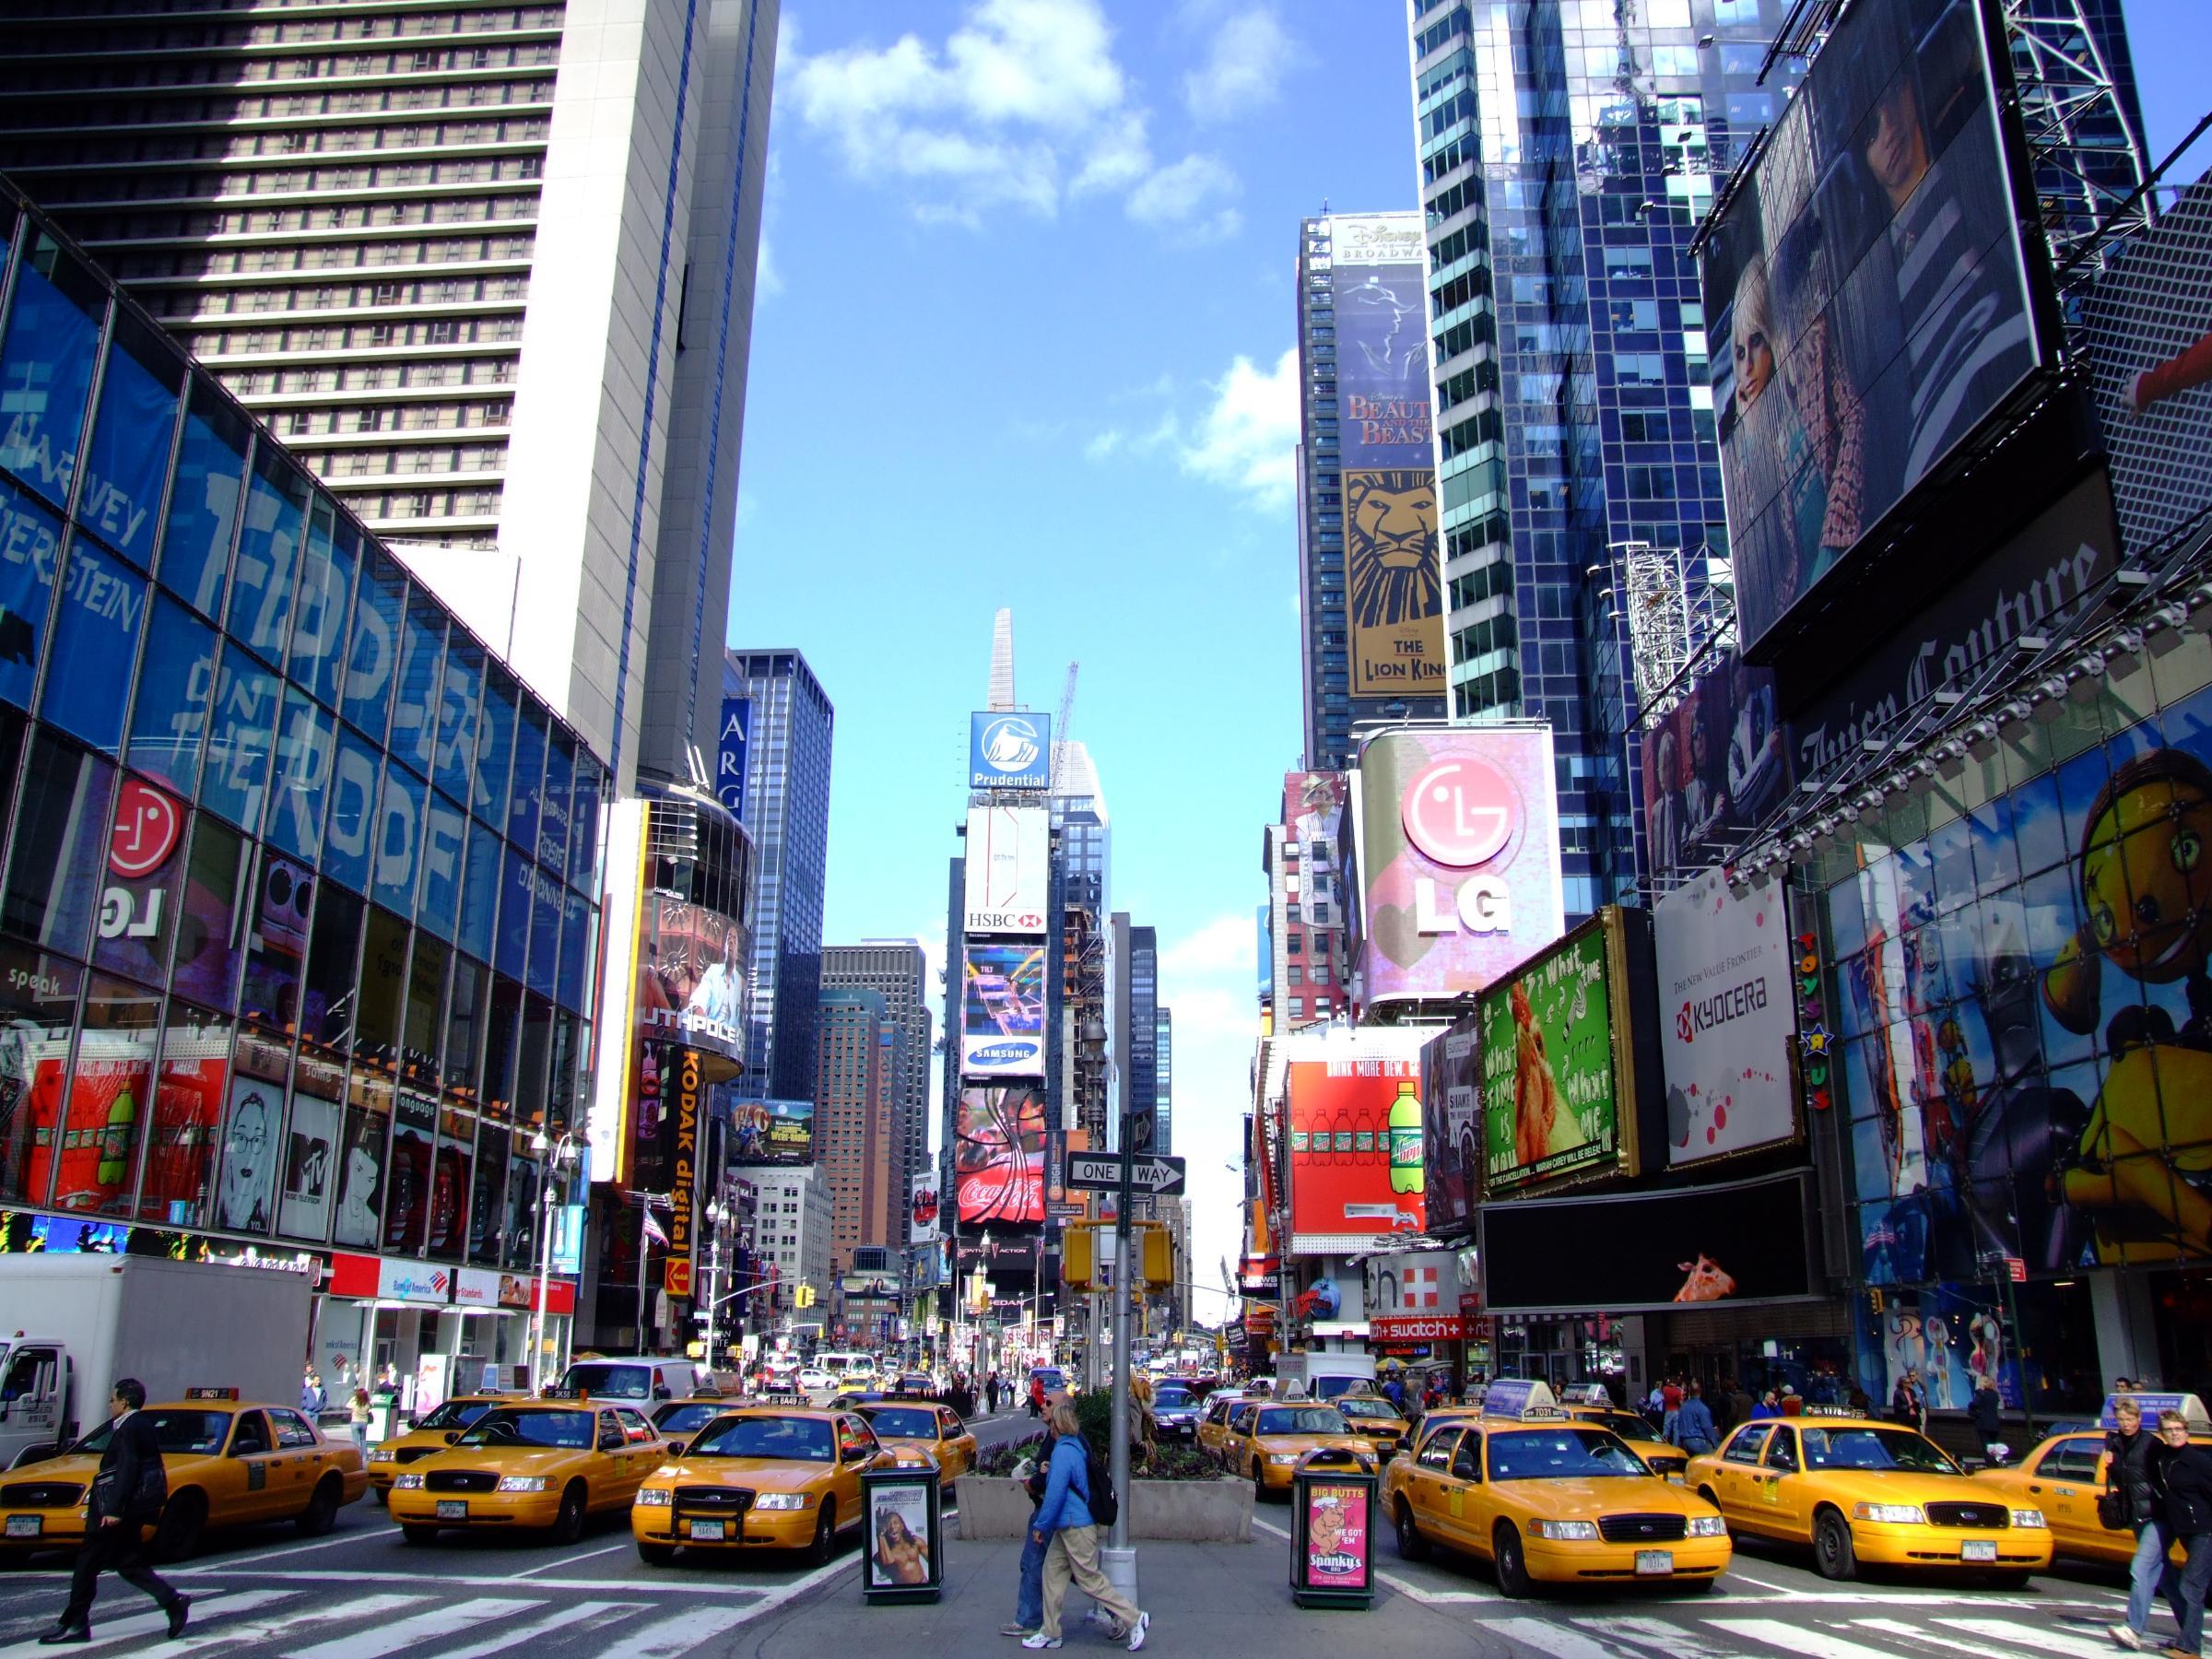 New York 2, New York 2